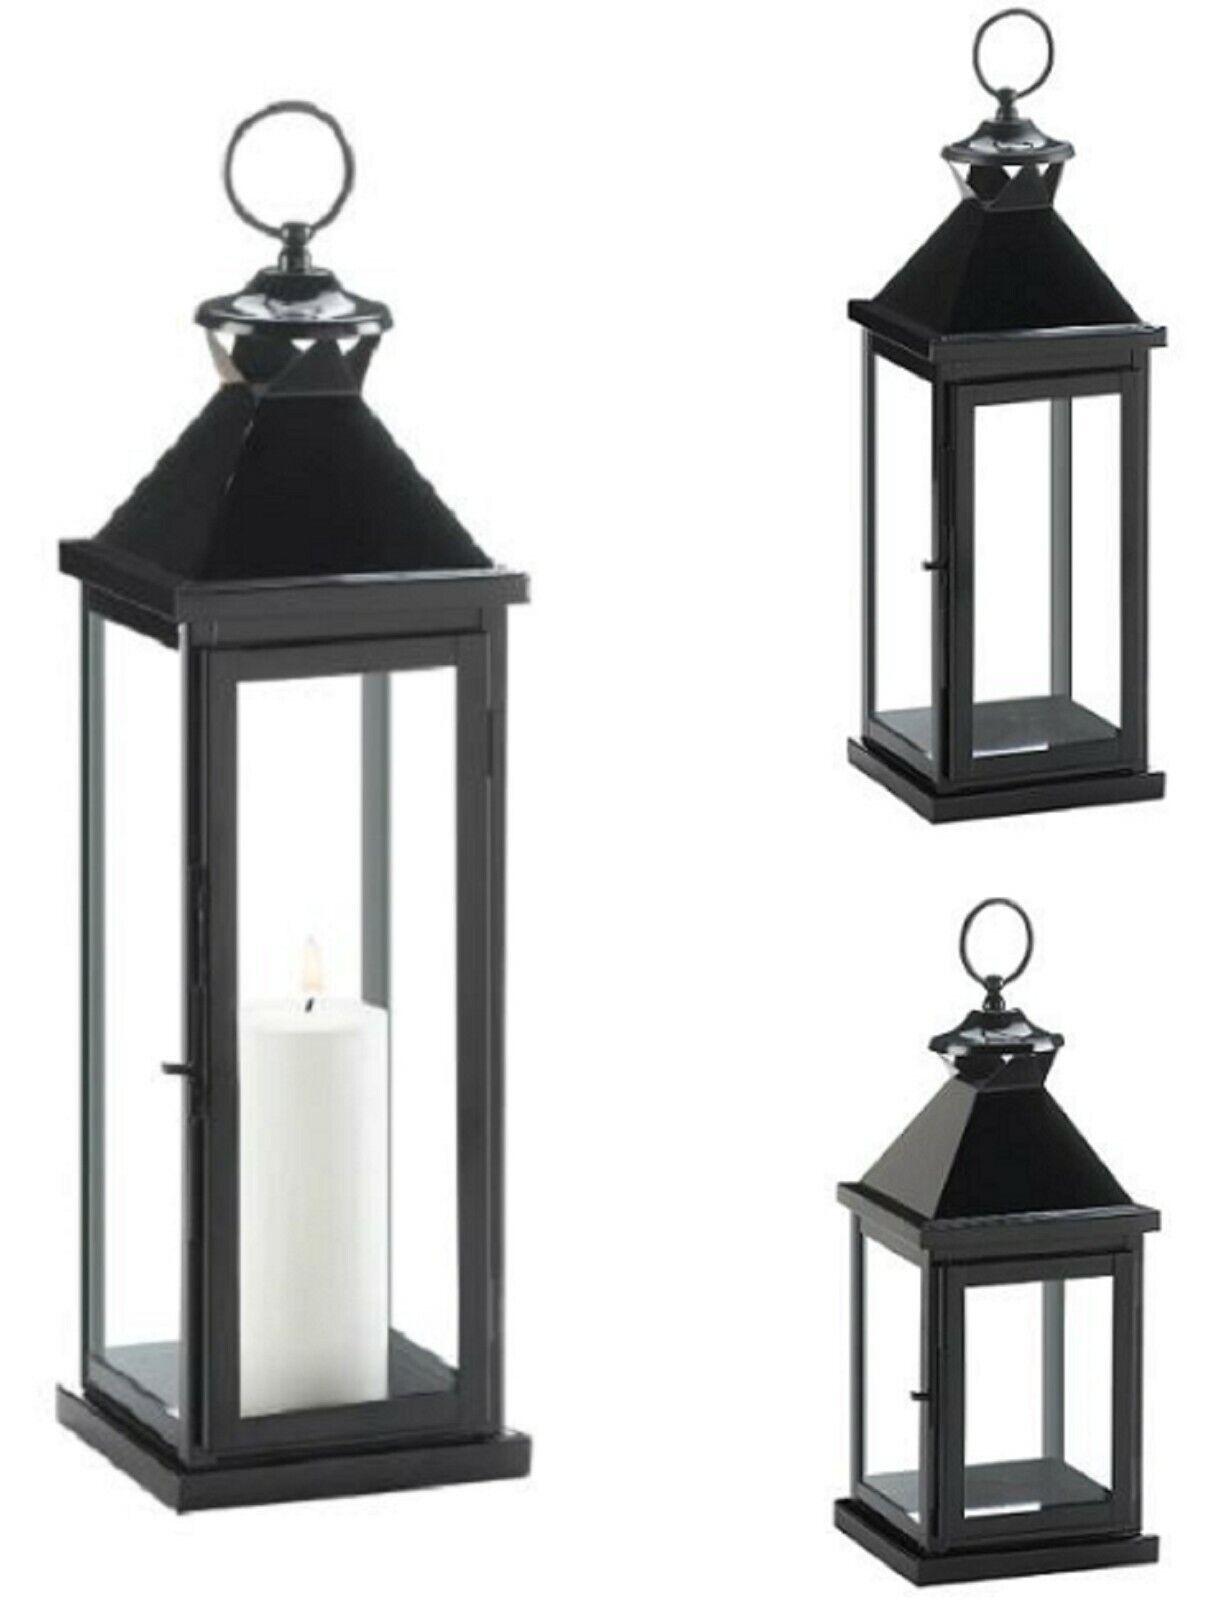 Large Lantern Lights White Decorative Hanging Outdoor Pillar Candle Lantern For Sale Online Ebay